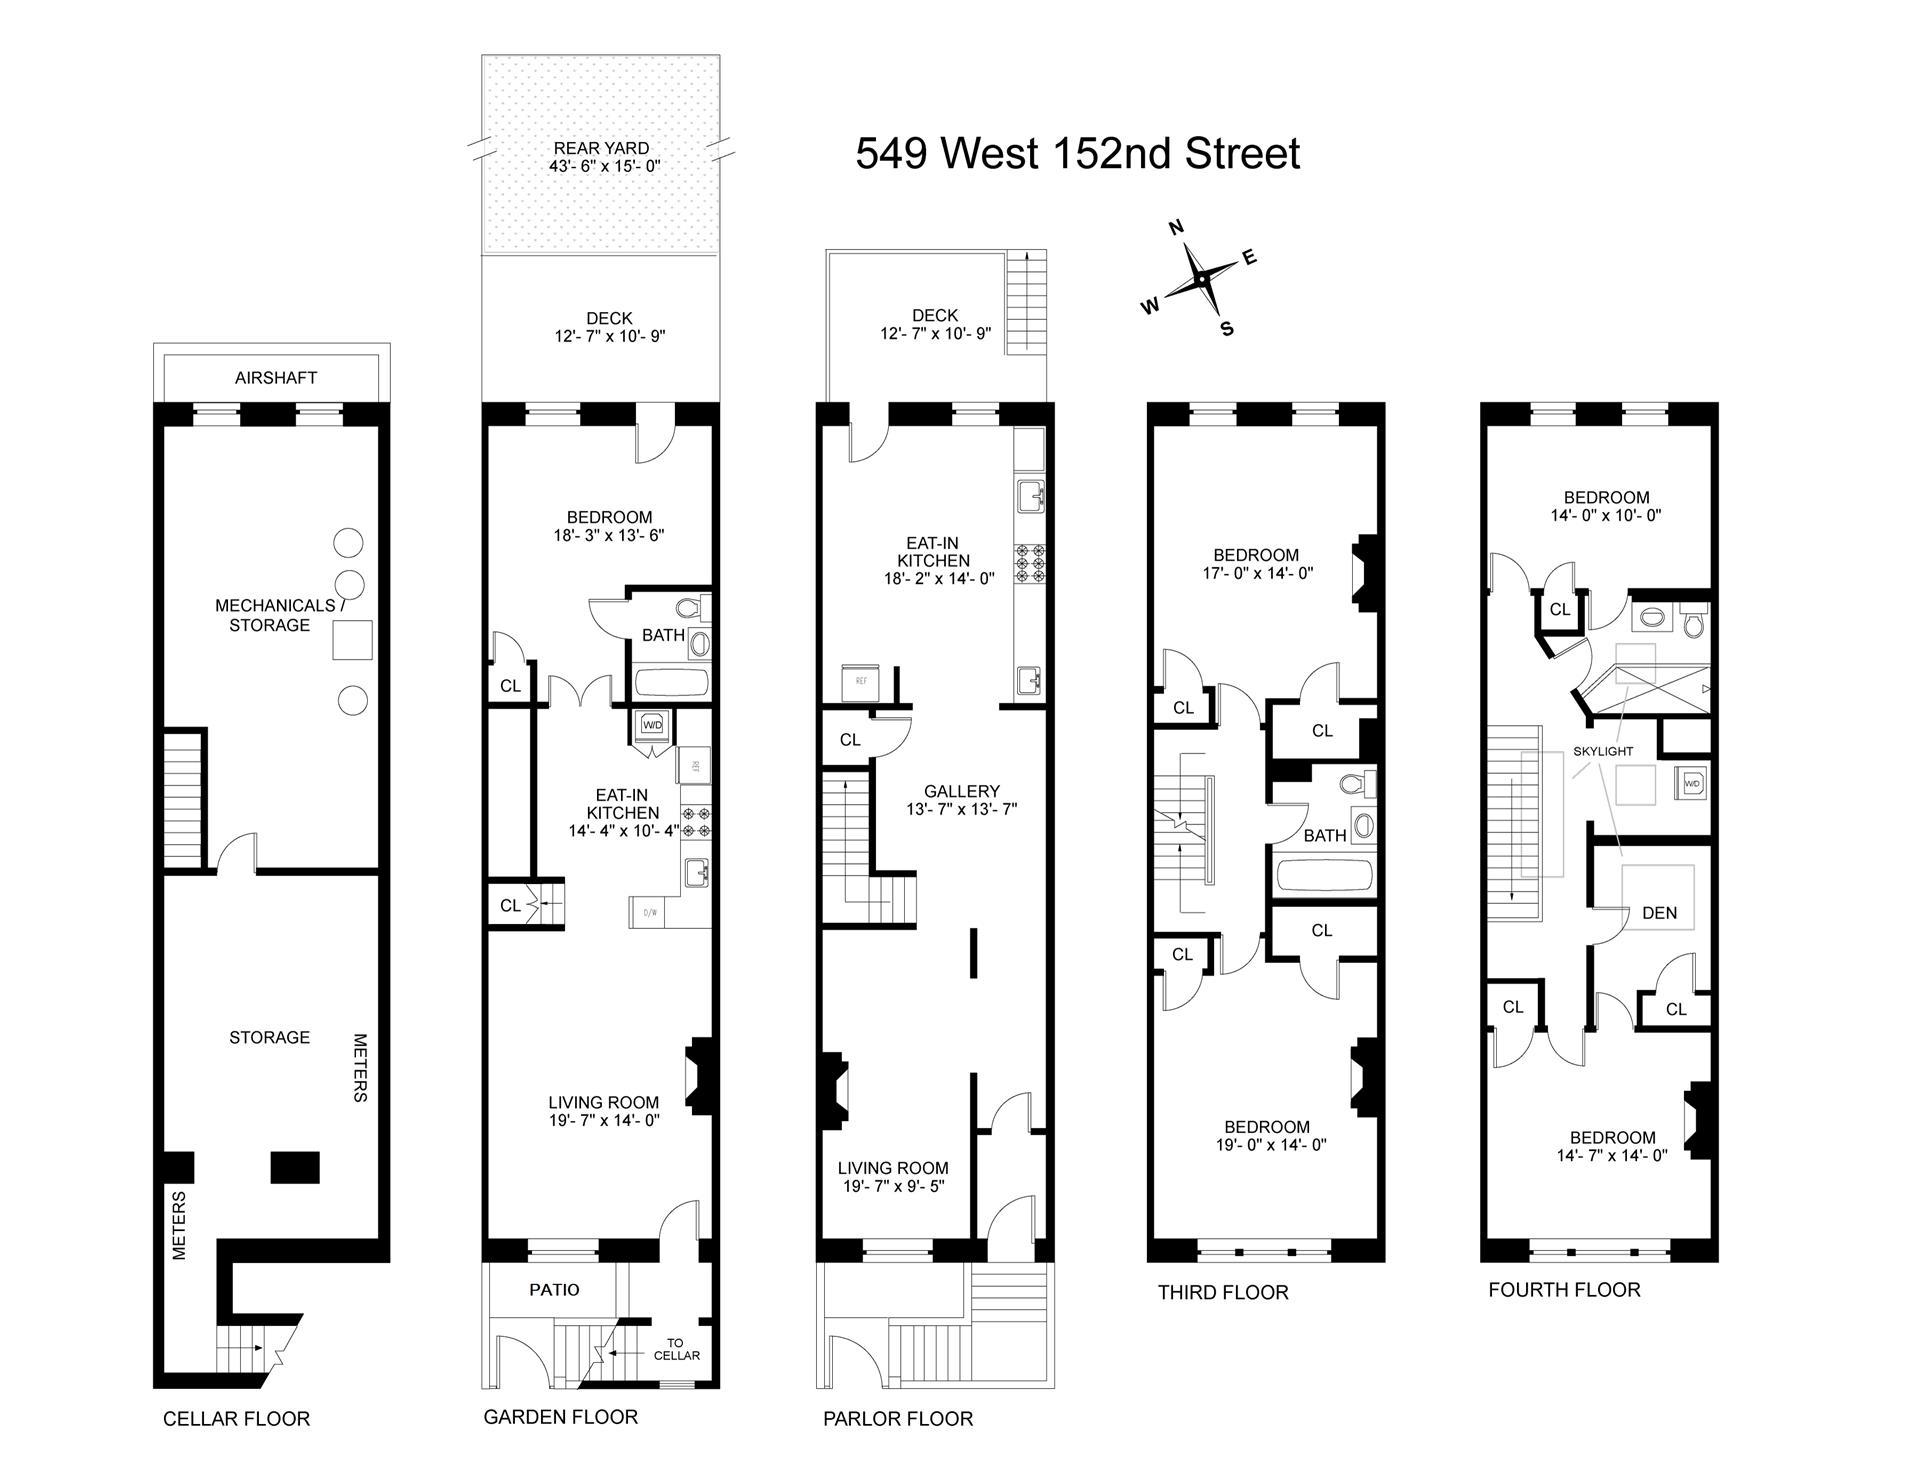 Floor plan of 549 West 152nd St - Hamilton Heights, New York